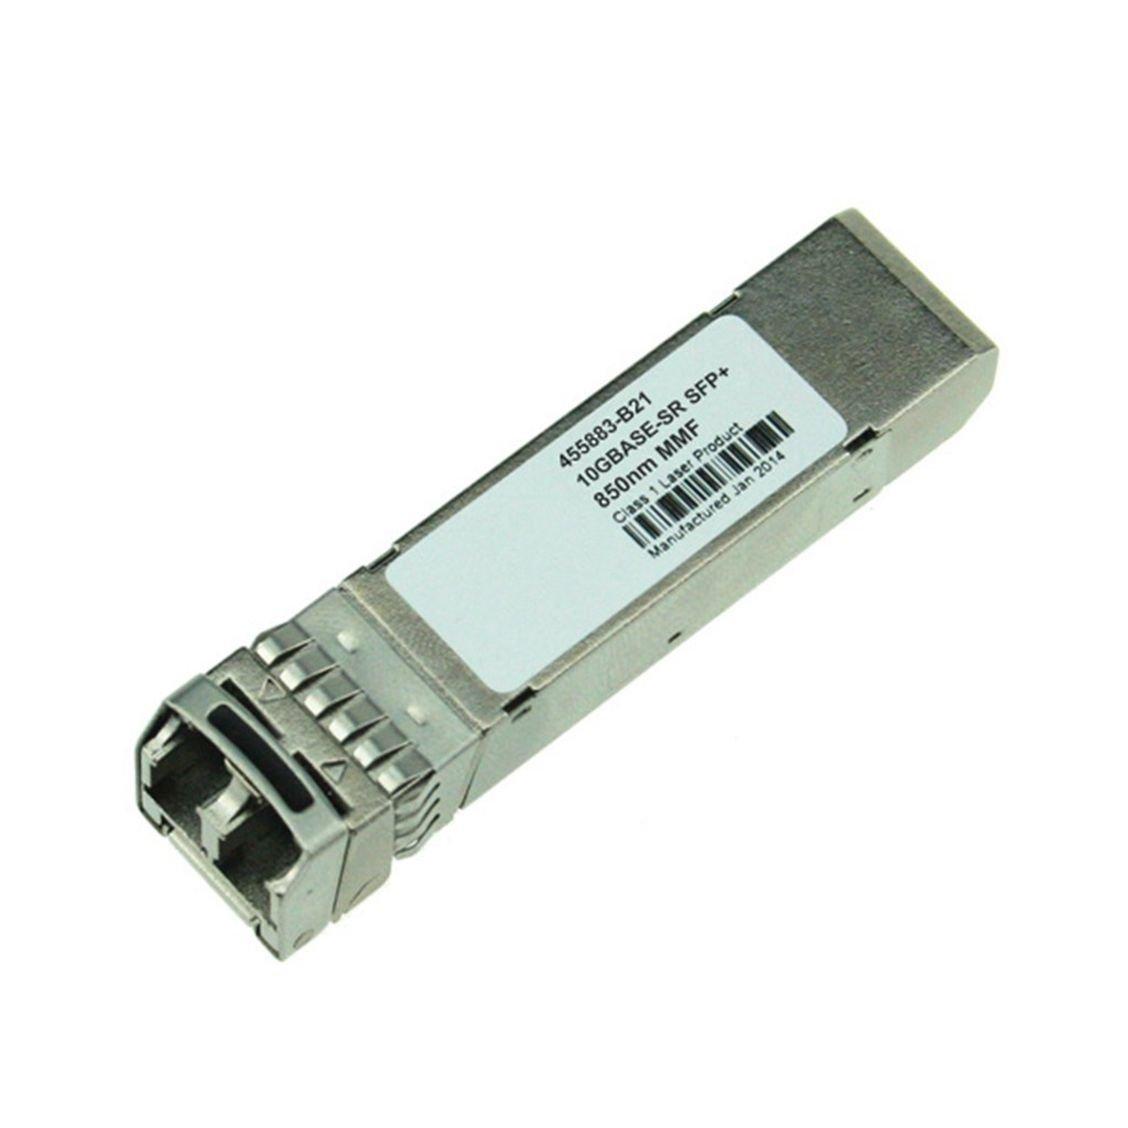 LODFIBER 455883-B21 Compatible 10GBASE-SR SFP+ 850nm 300m DOM Transceiver